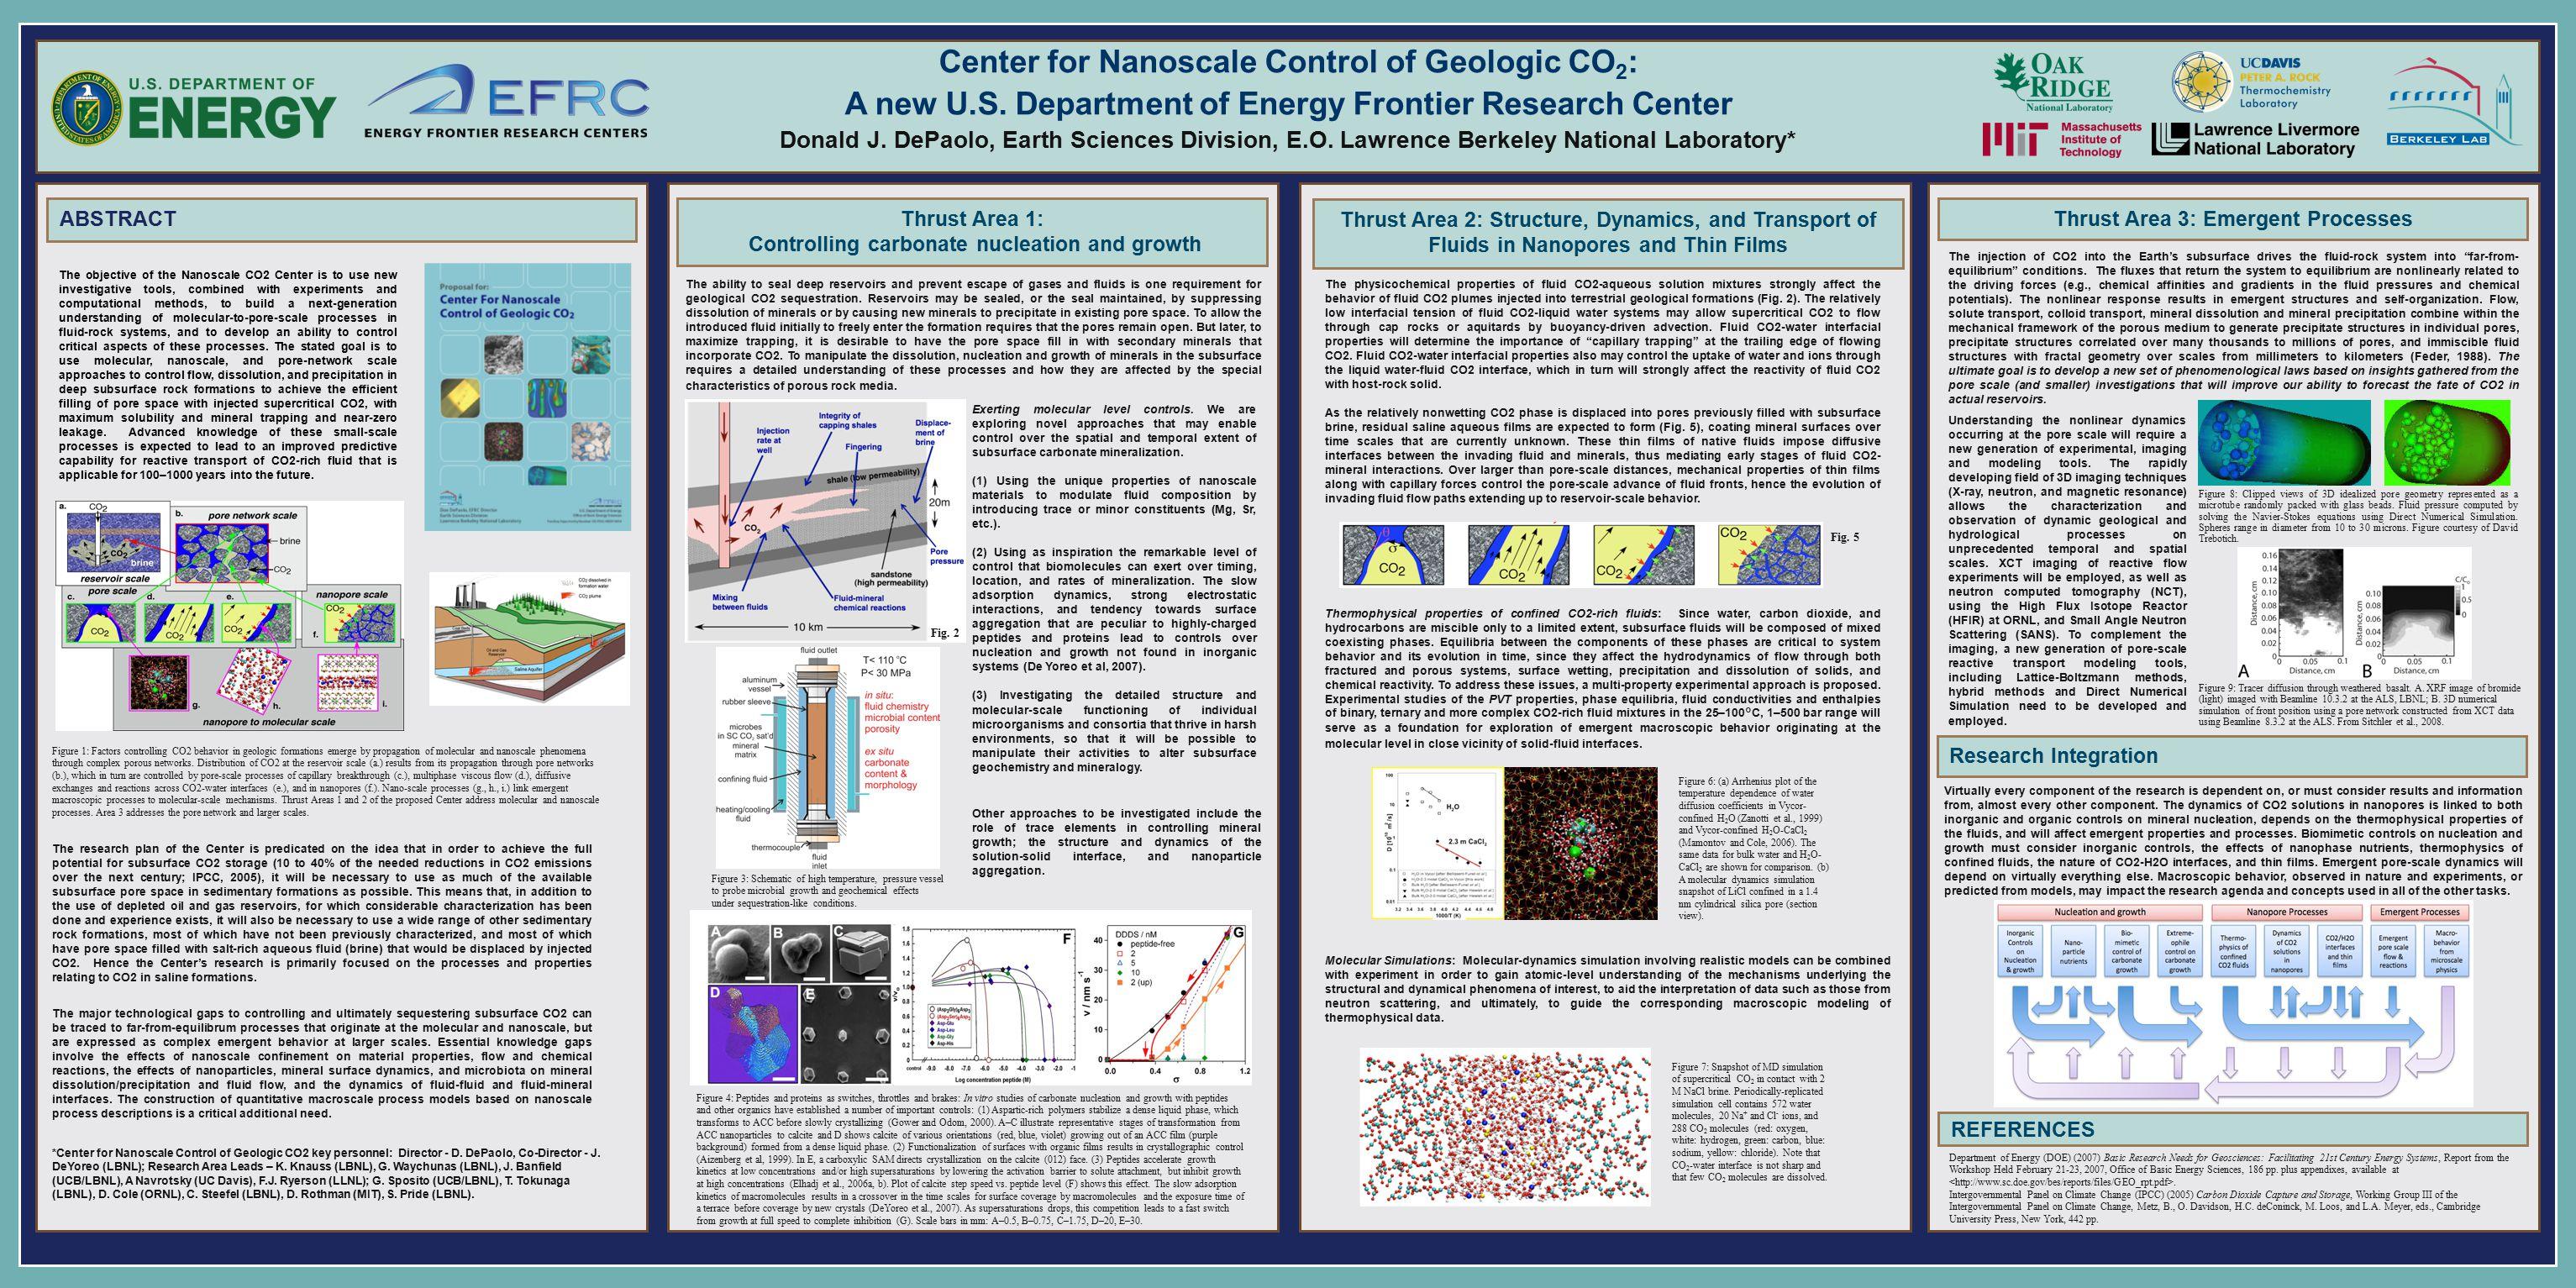 Center for Nanoscale Control of Geologic CO 2 : A new U.S.